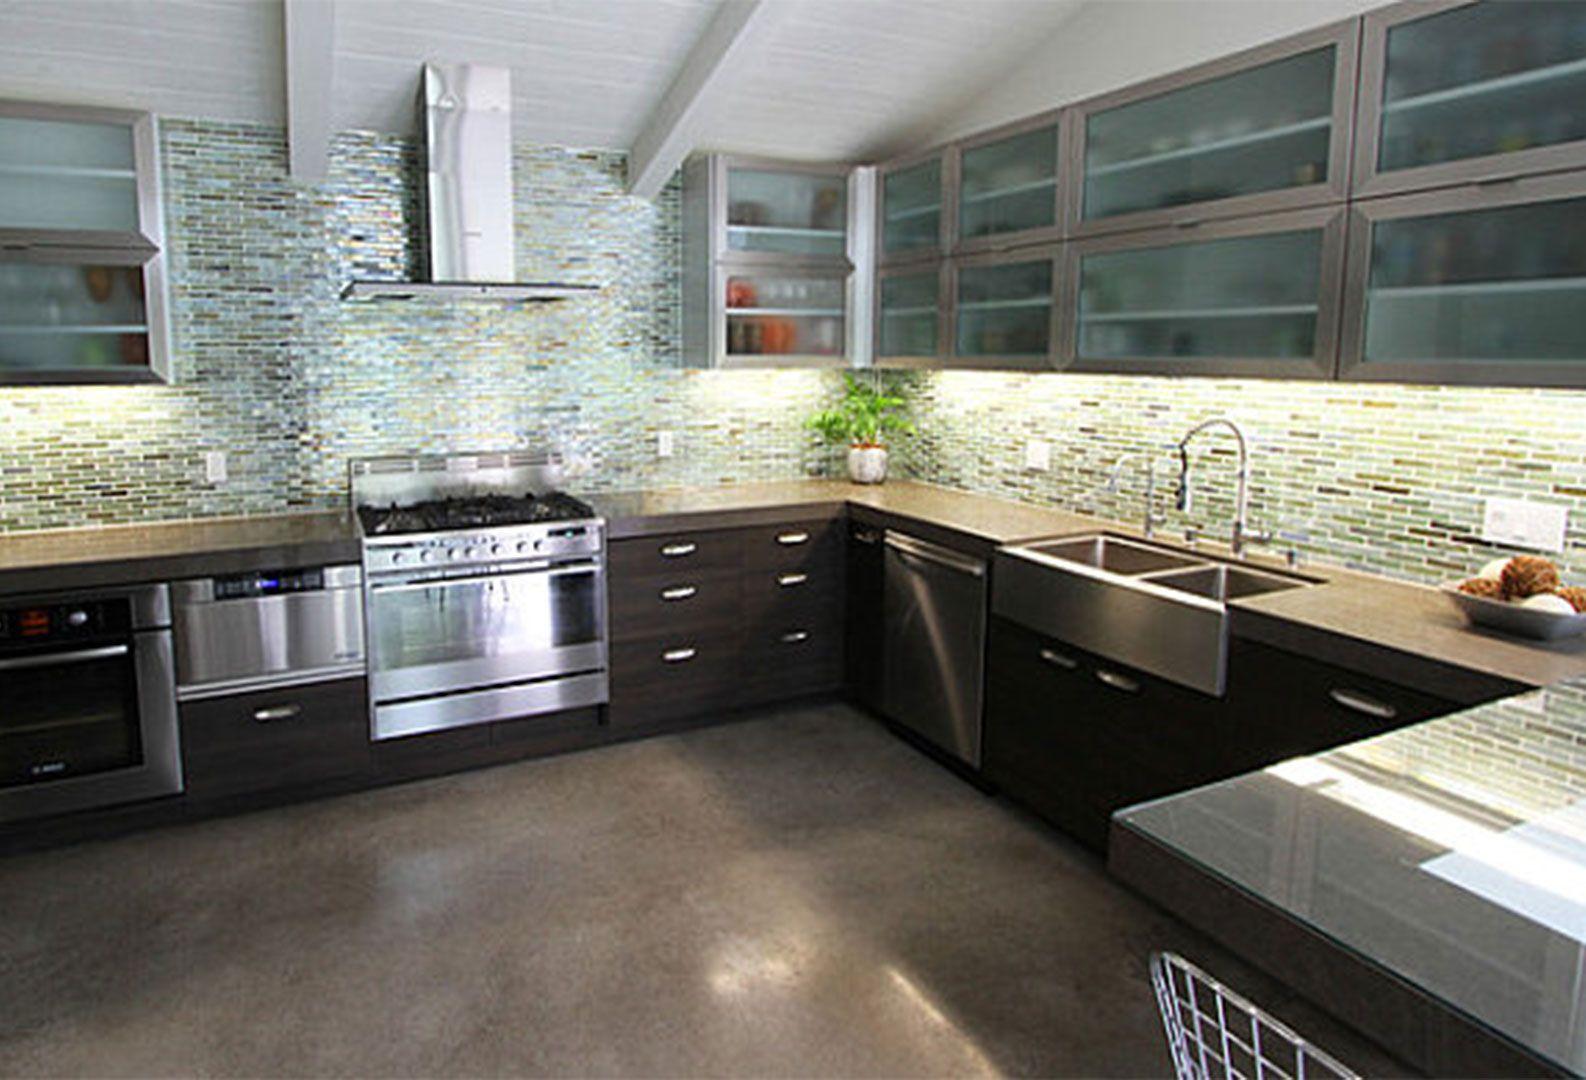 Terrific | Home Decor Ideas | Pinterest | Modern kitchen cabinets ...